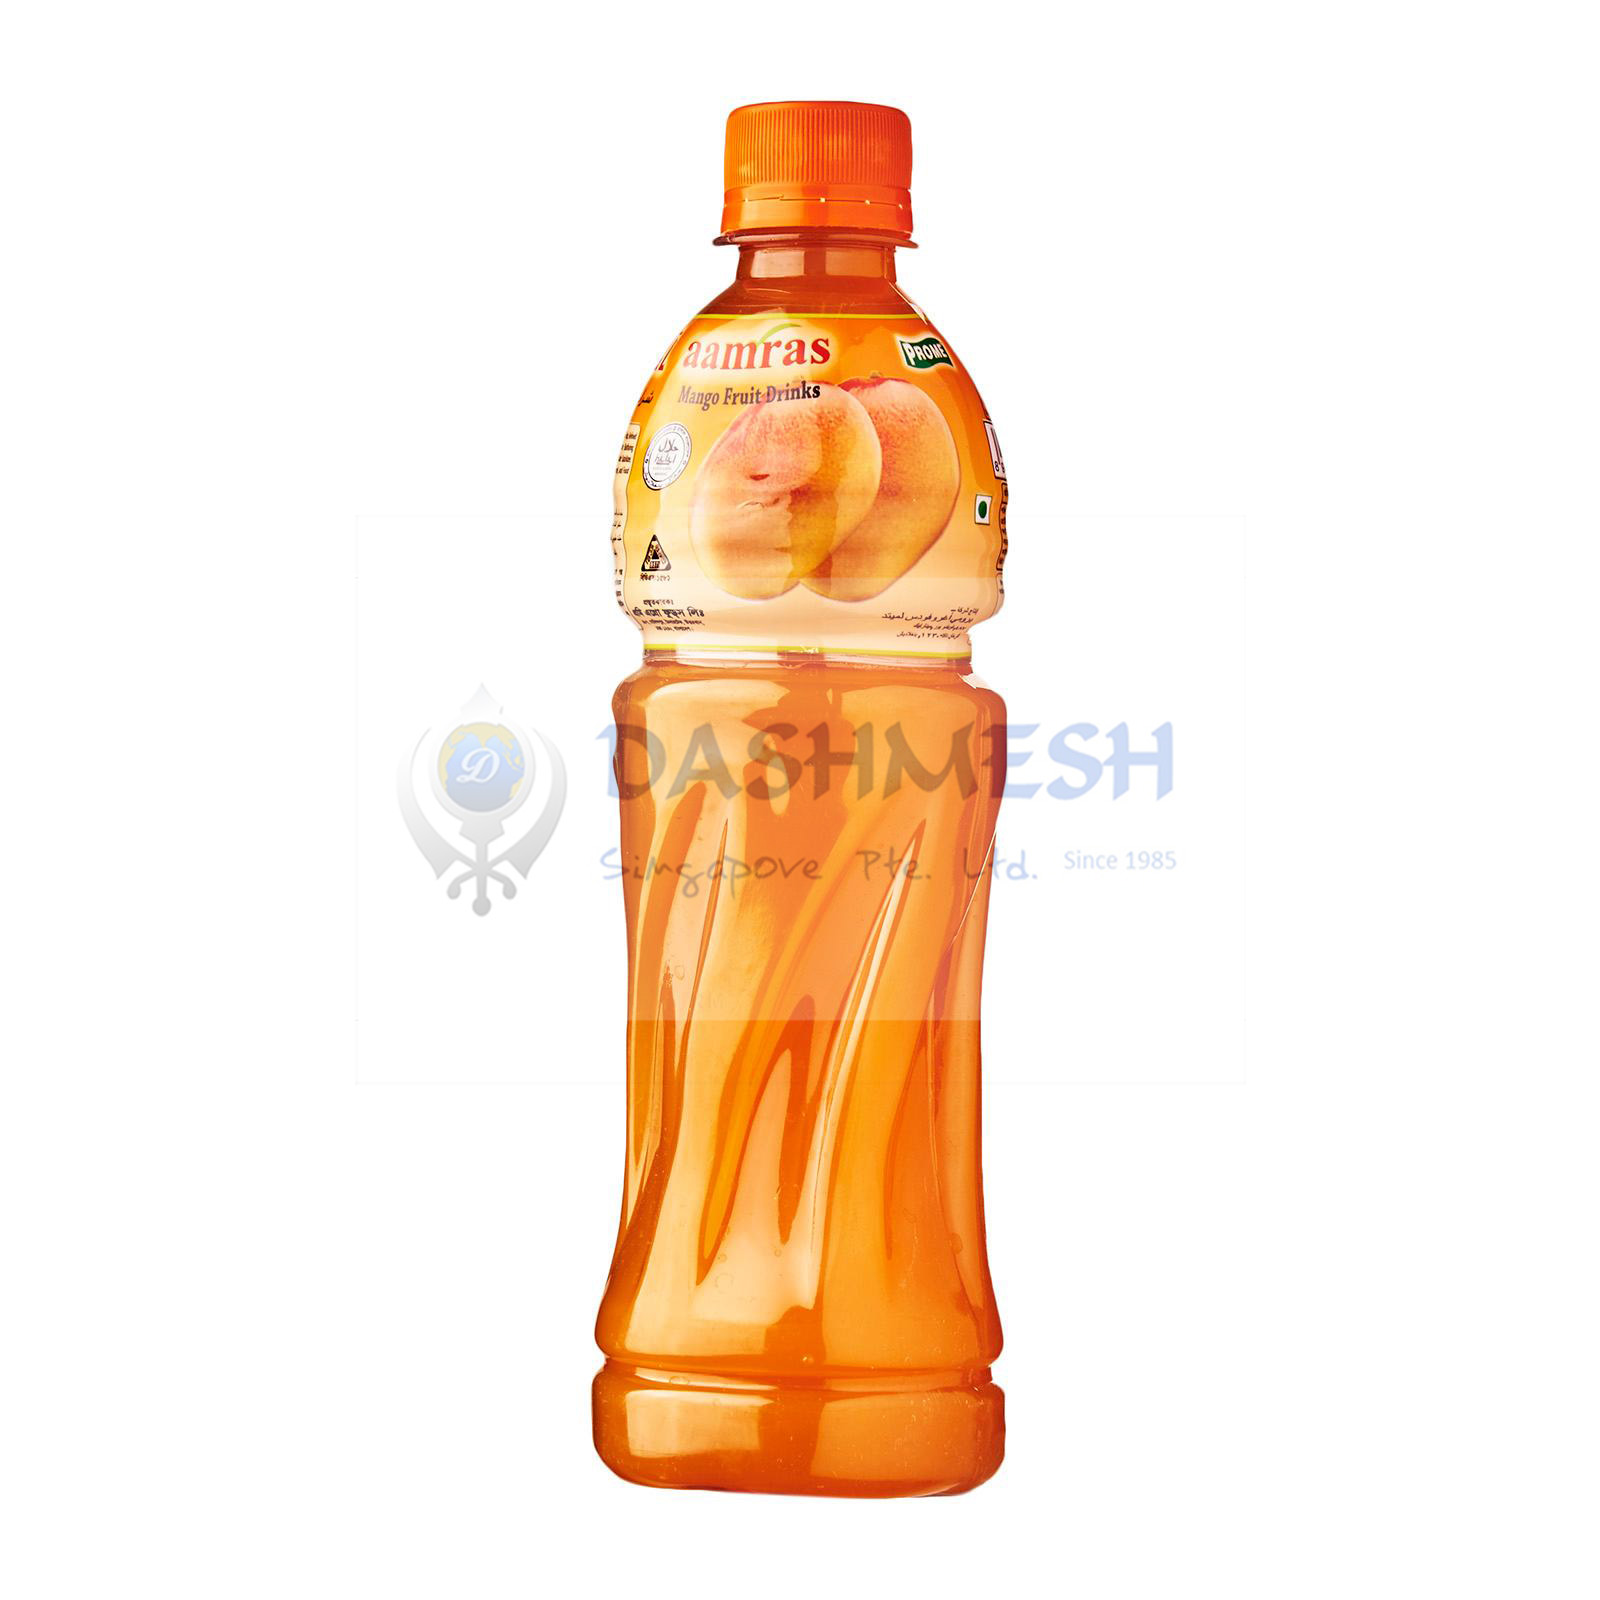 Prome Aamras (Mango Juice) 500ml